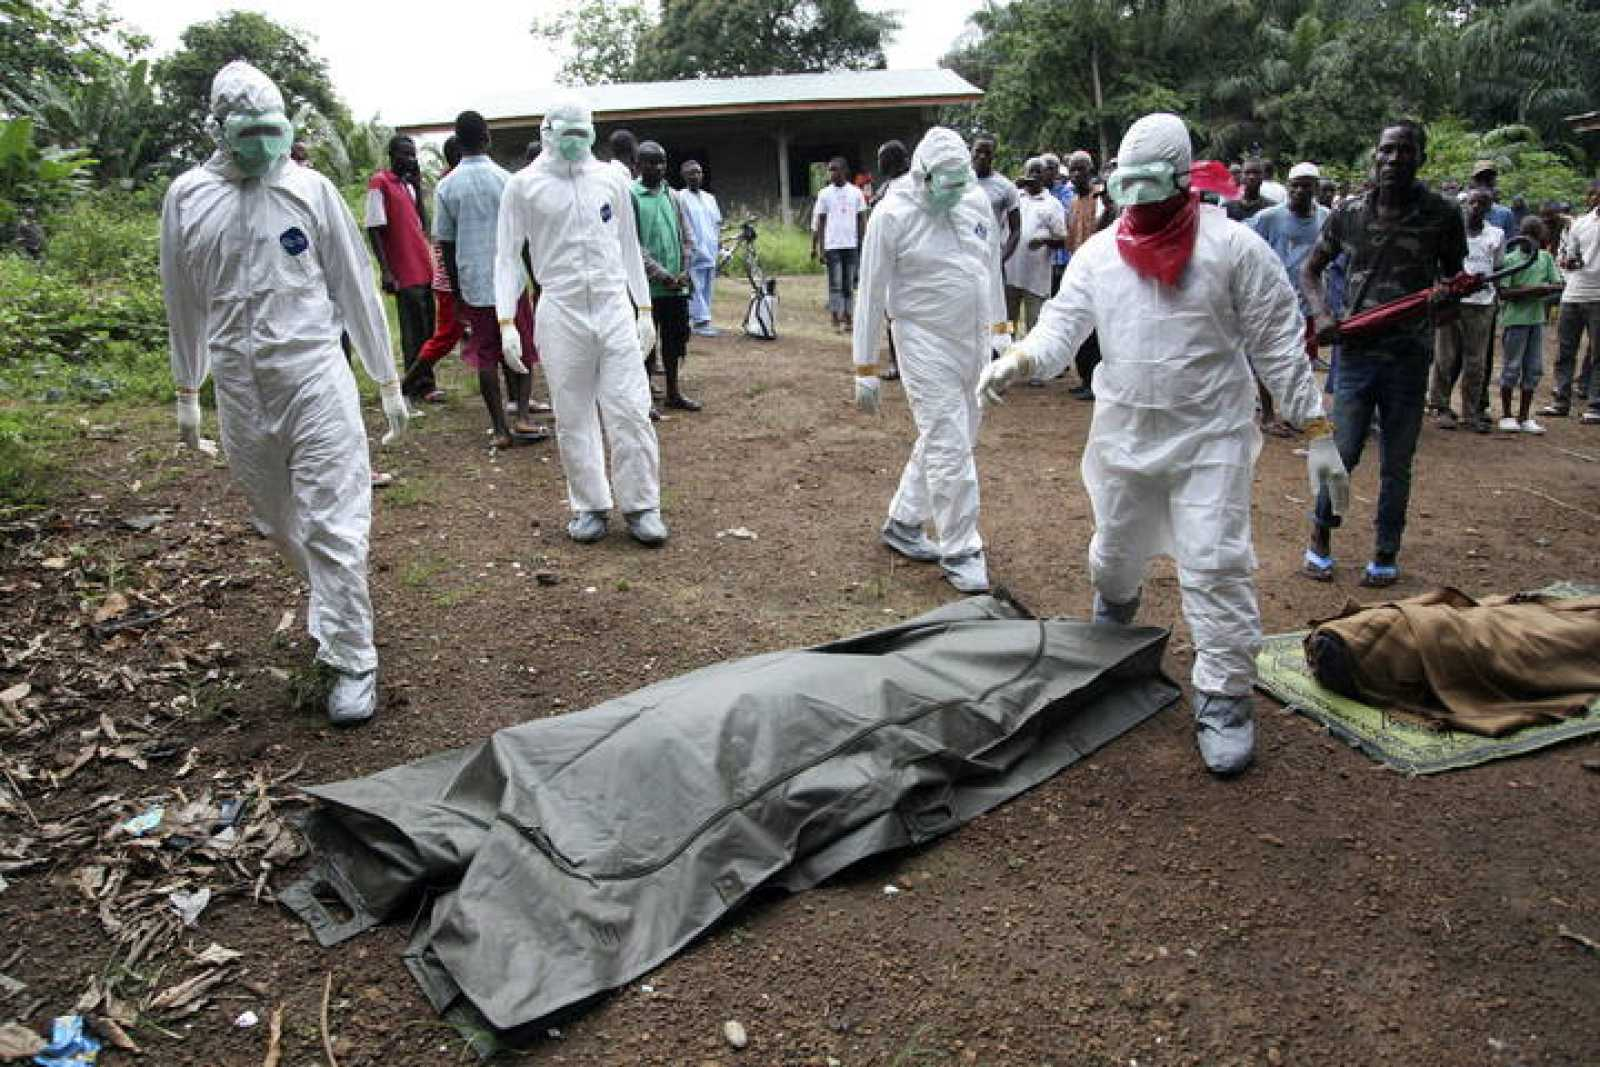 Enfermeros a punto de recoger a víctimas del virus del ébola en Liberia